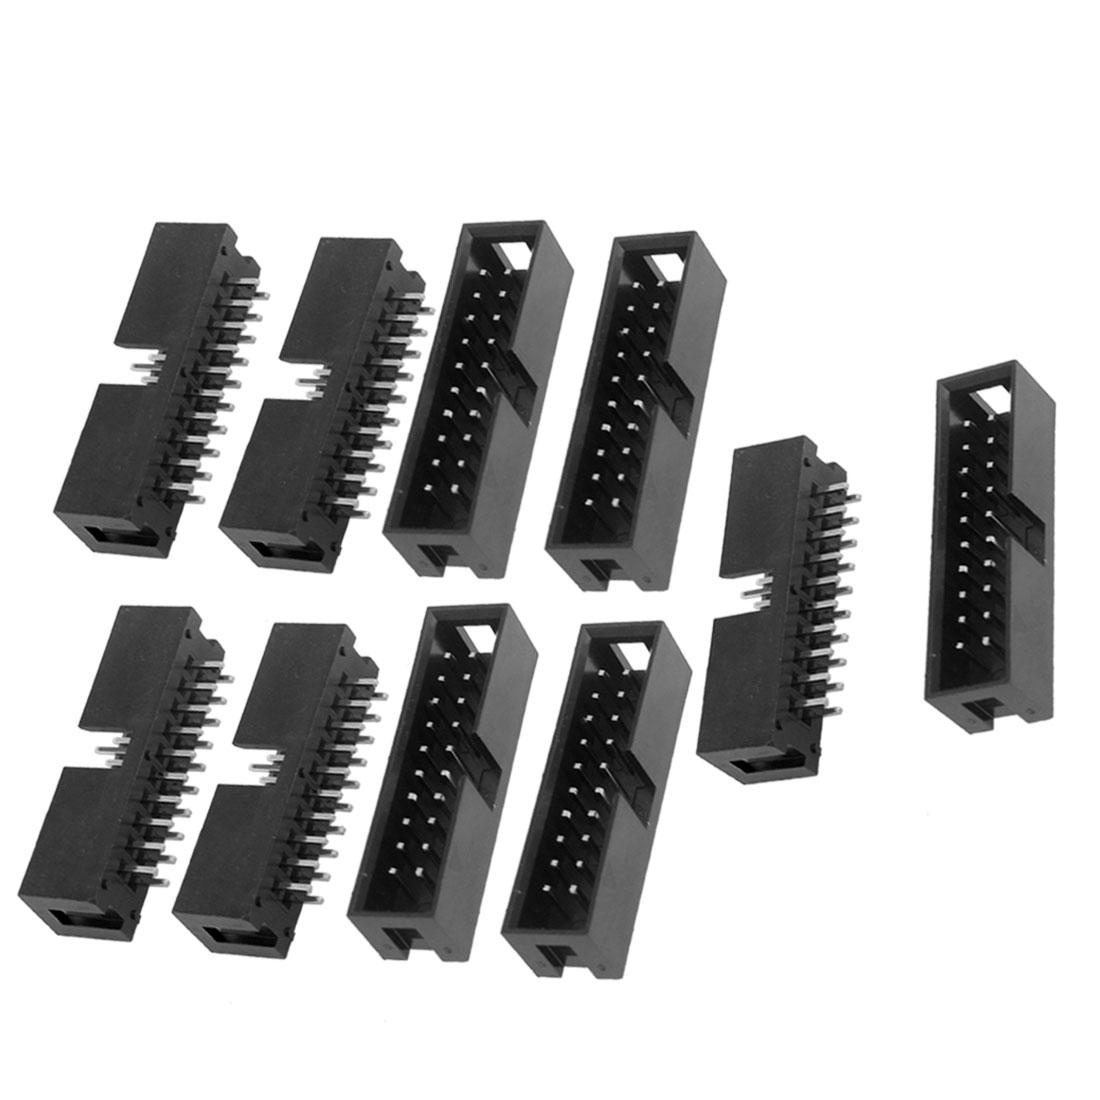 10 Pcs Download Interface 20 Pin Box Header Converter 2.54mm Pitch